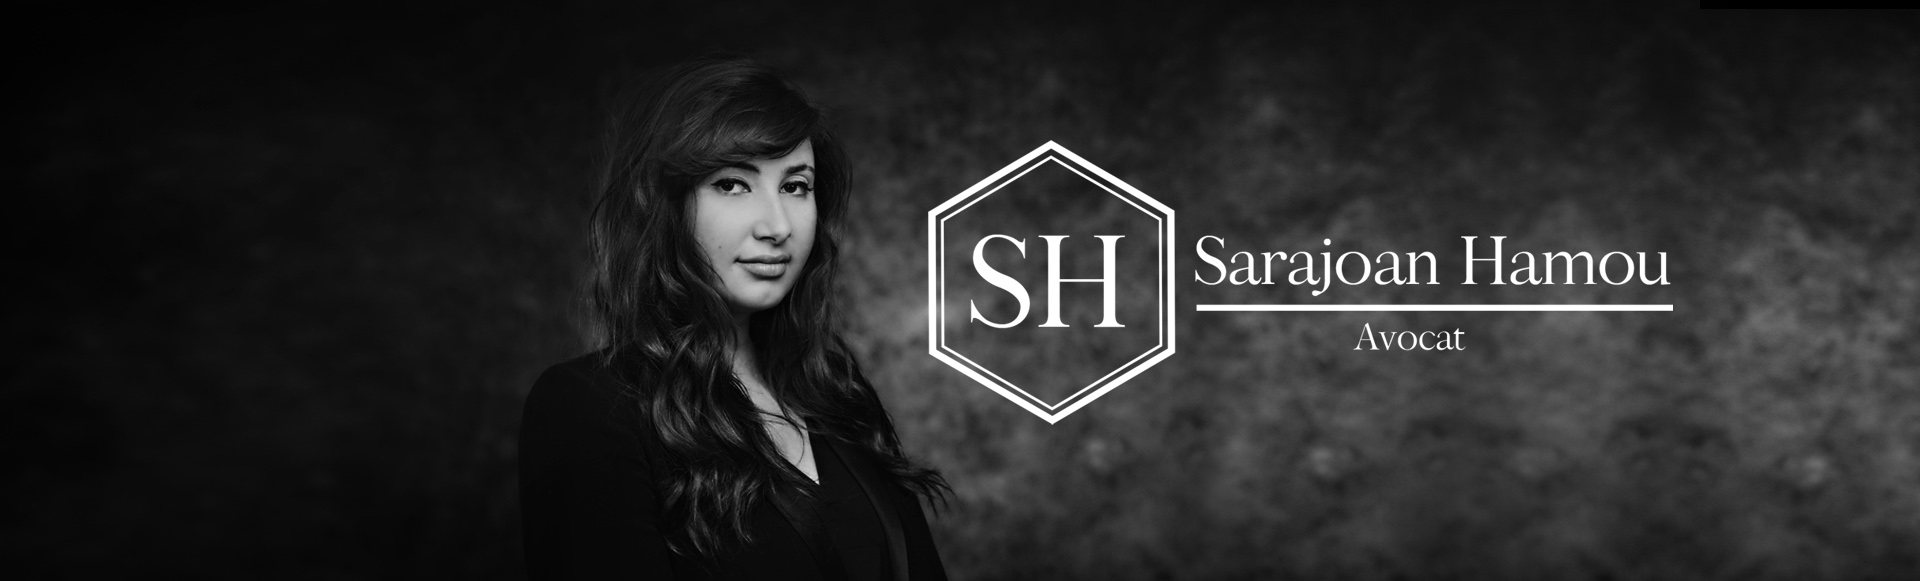 slider-Sarajoan-Hamou-web